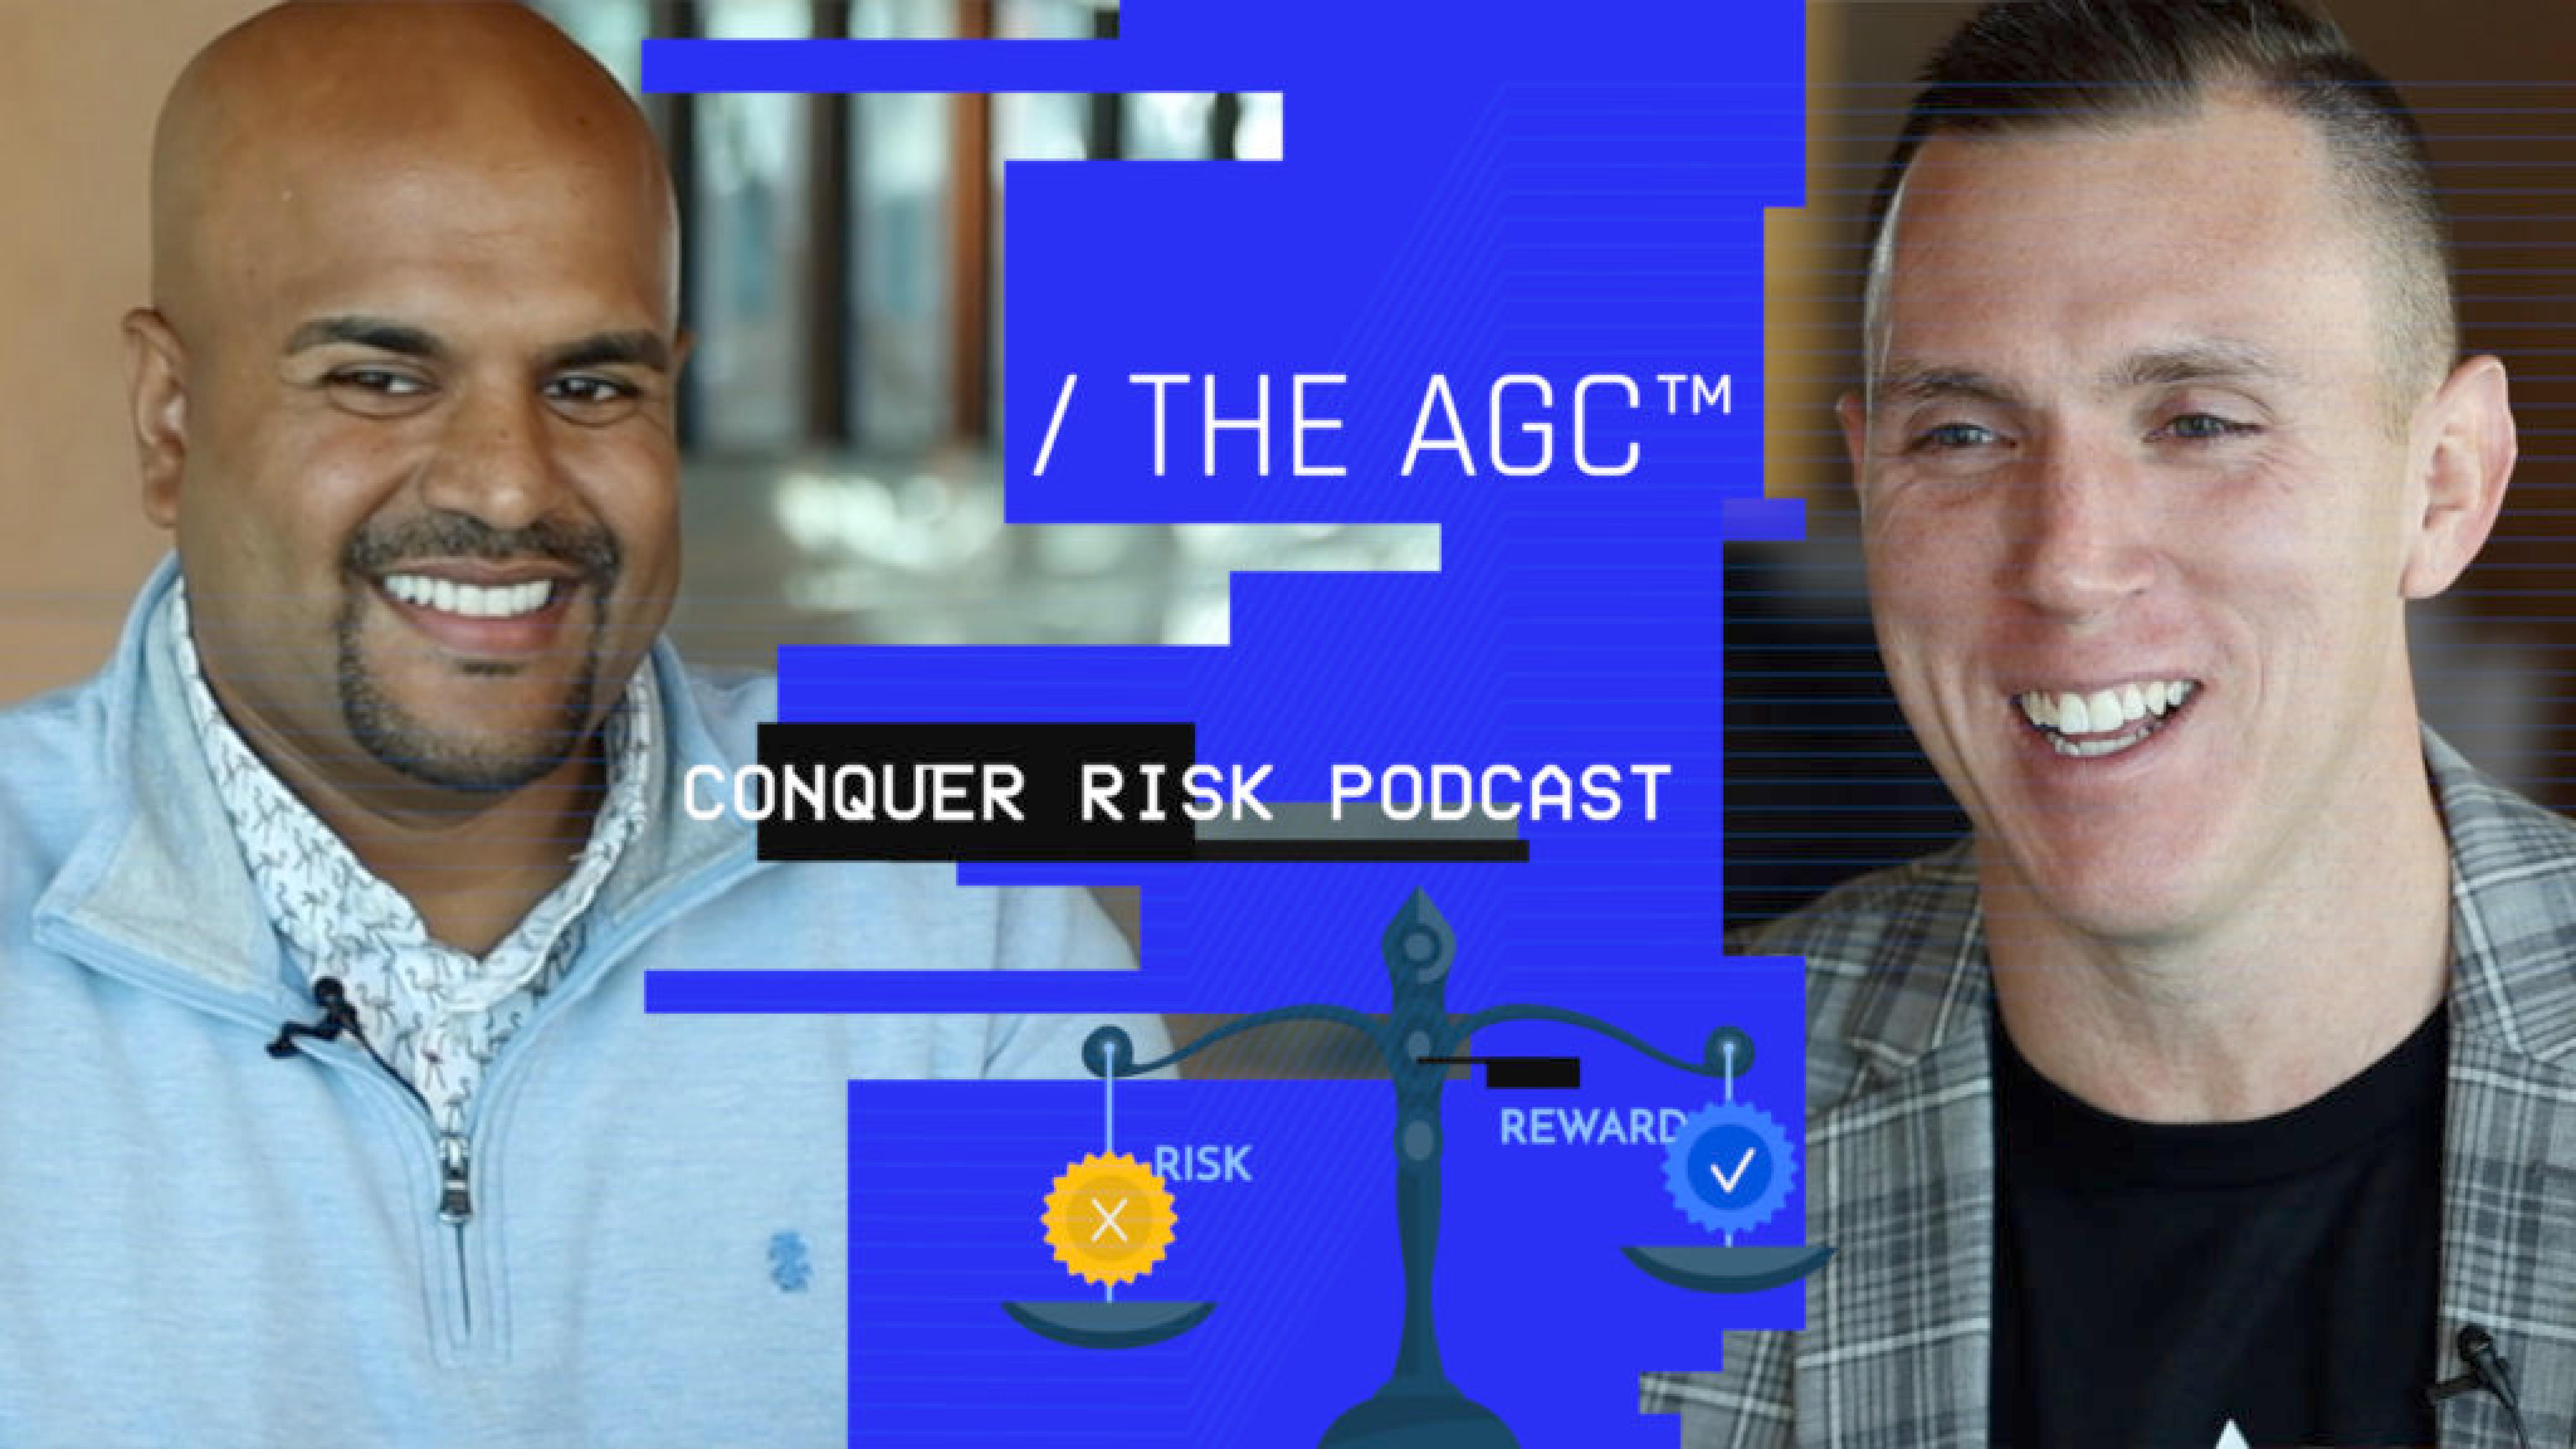 The AGC™ (S2 E21)